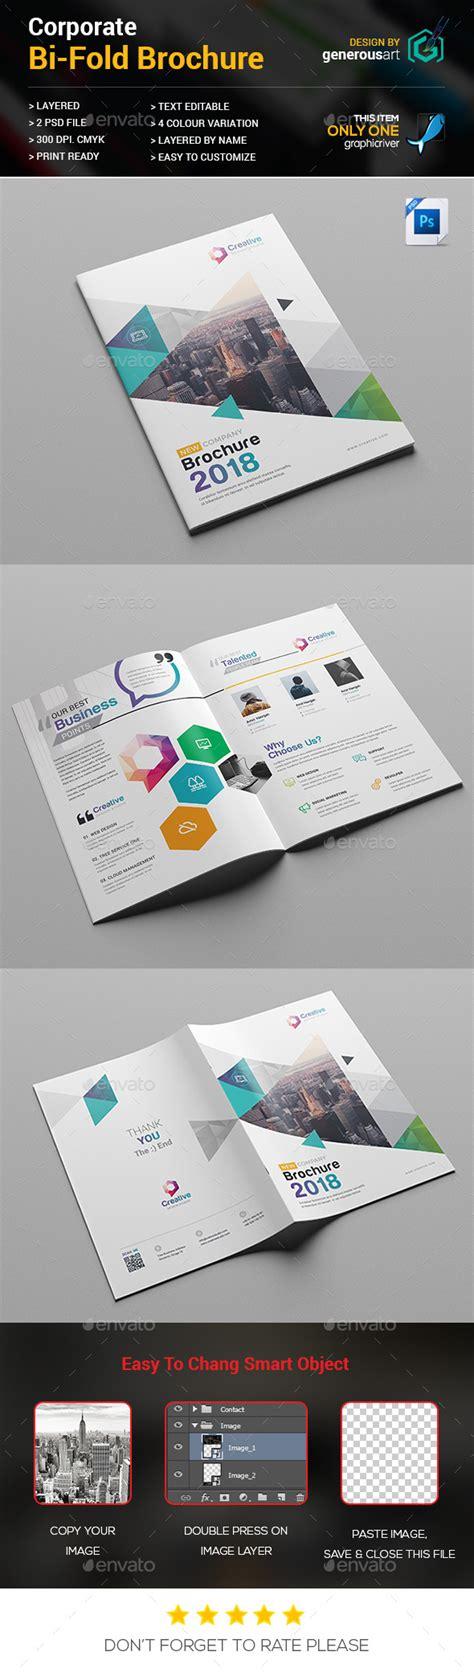 bi fold brochure template by generousart graphicriver